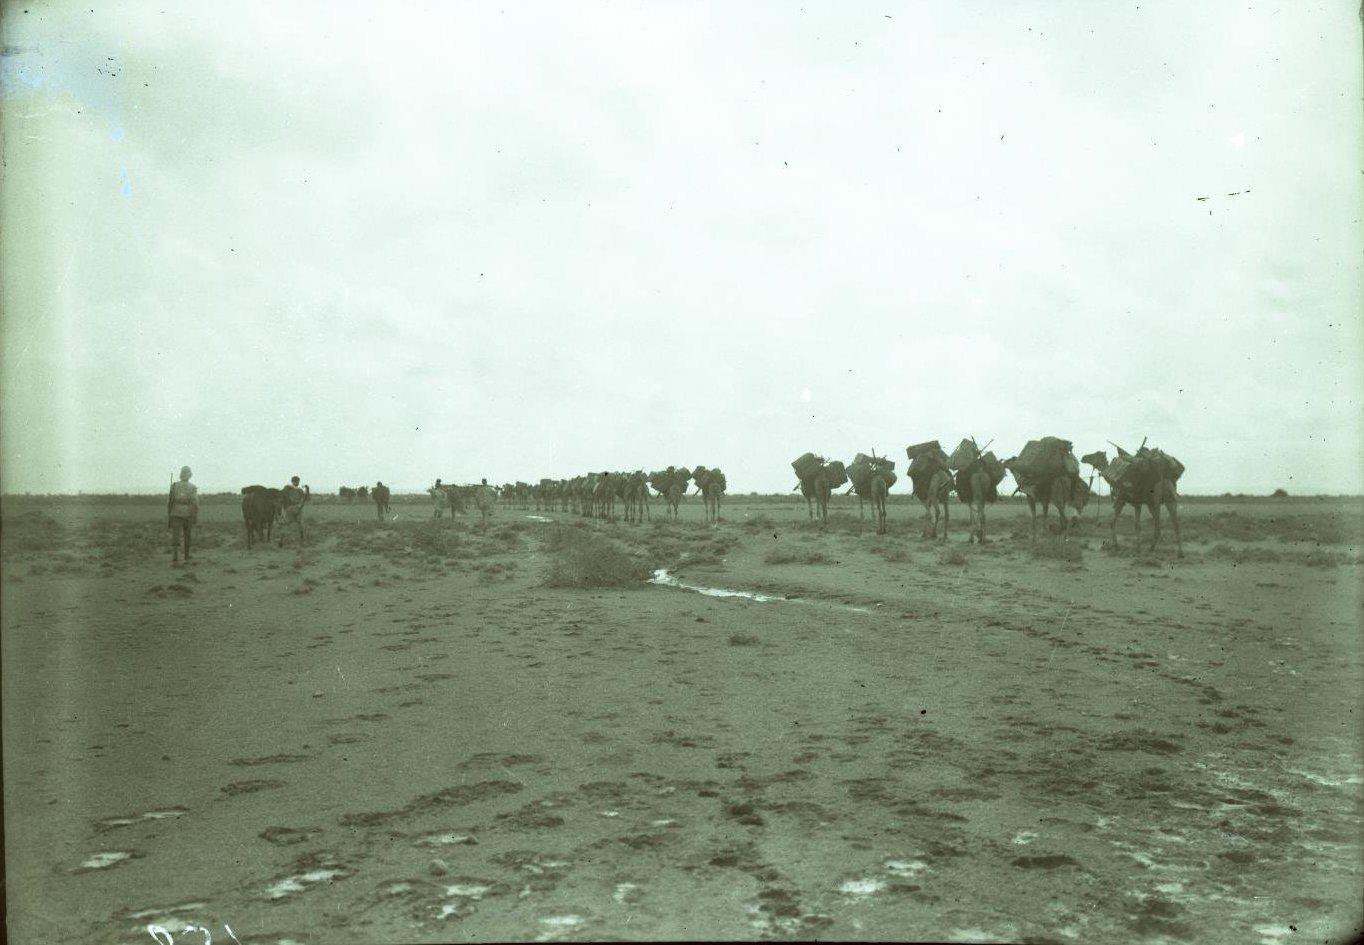 132. В сомалийской пустыне. Салман. По грязи